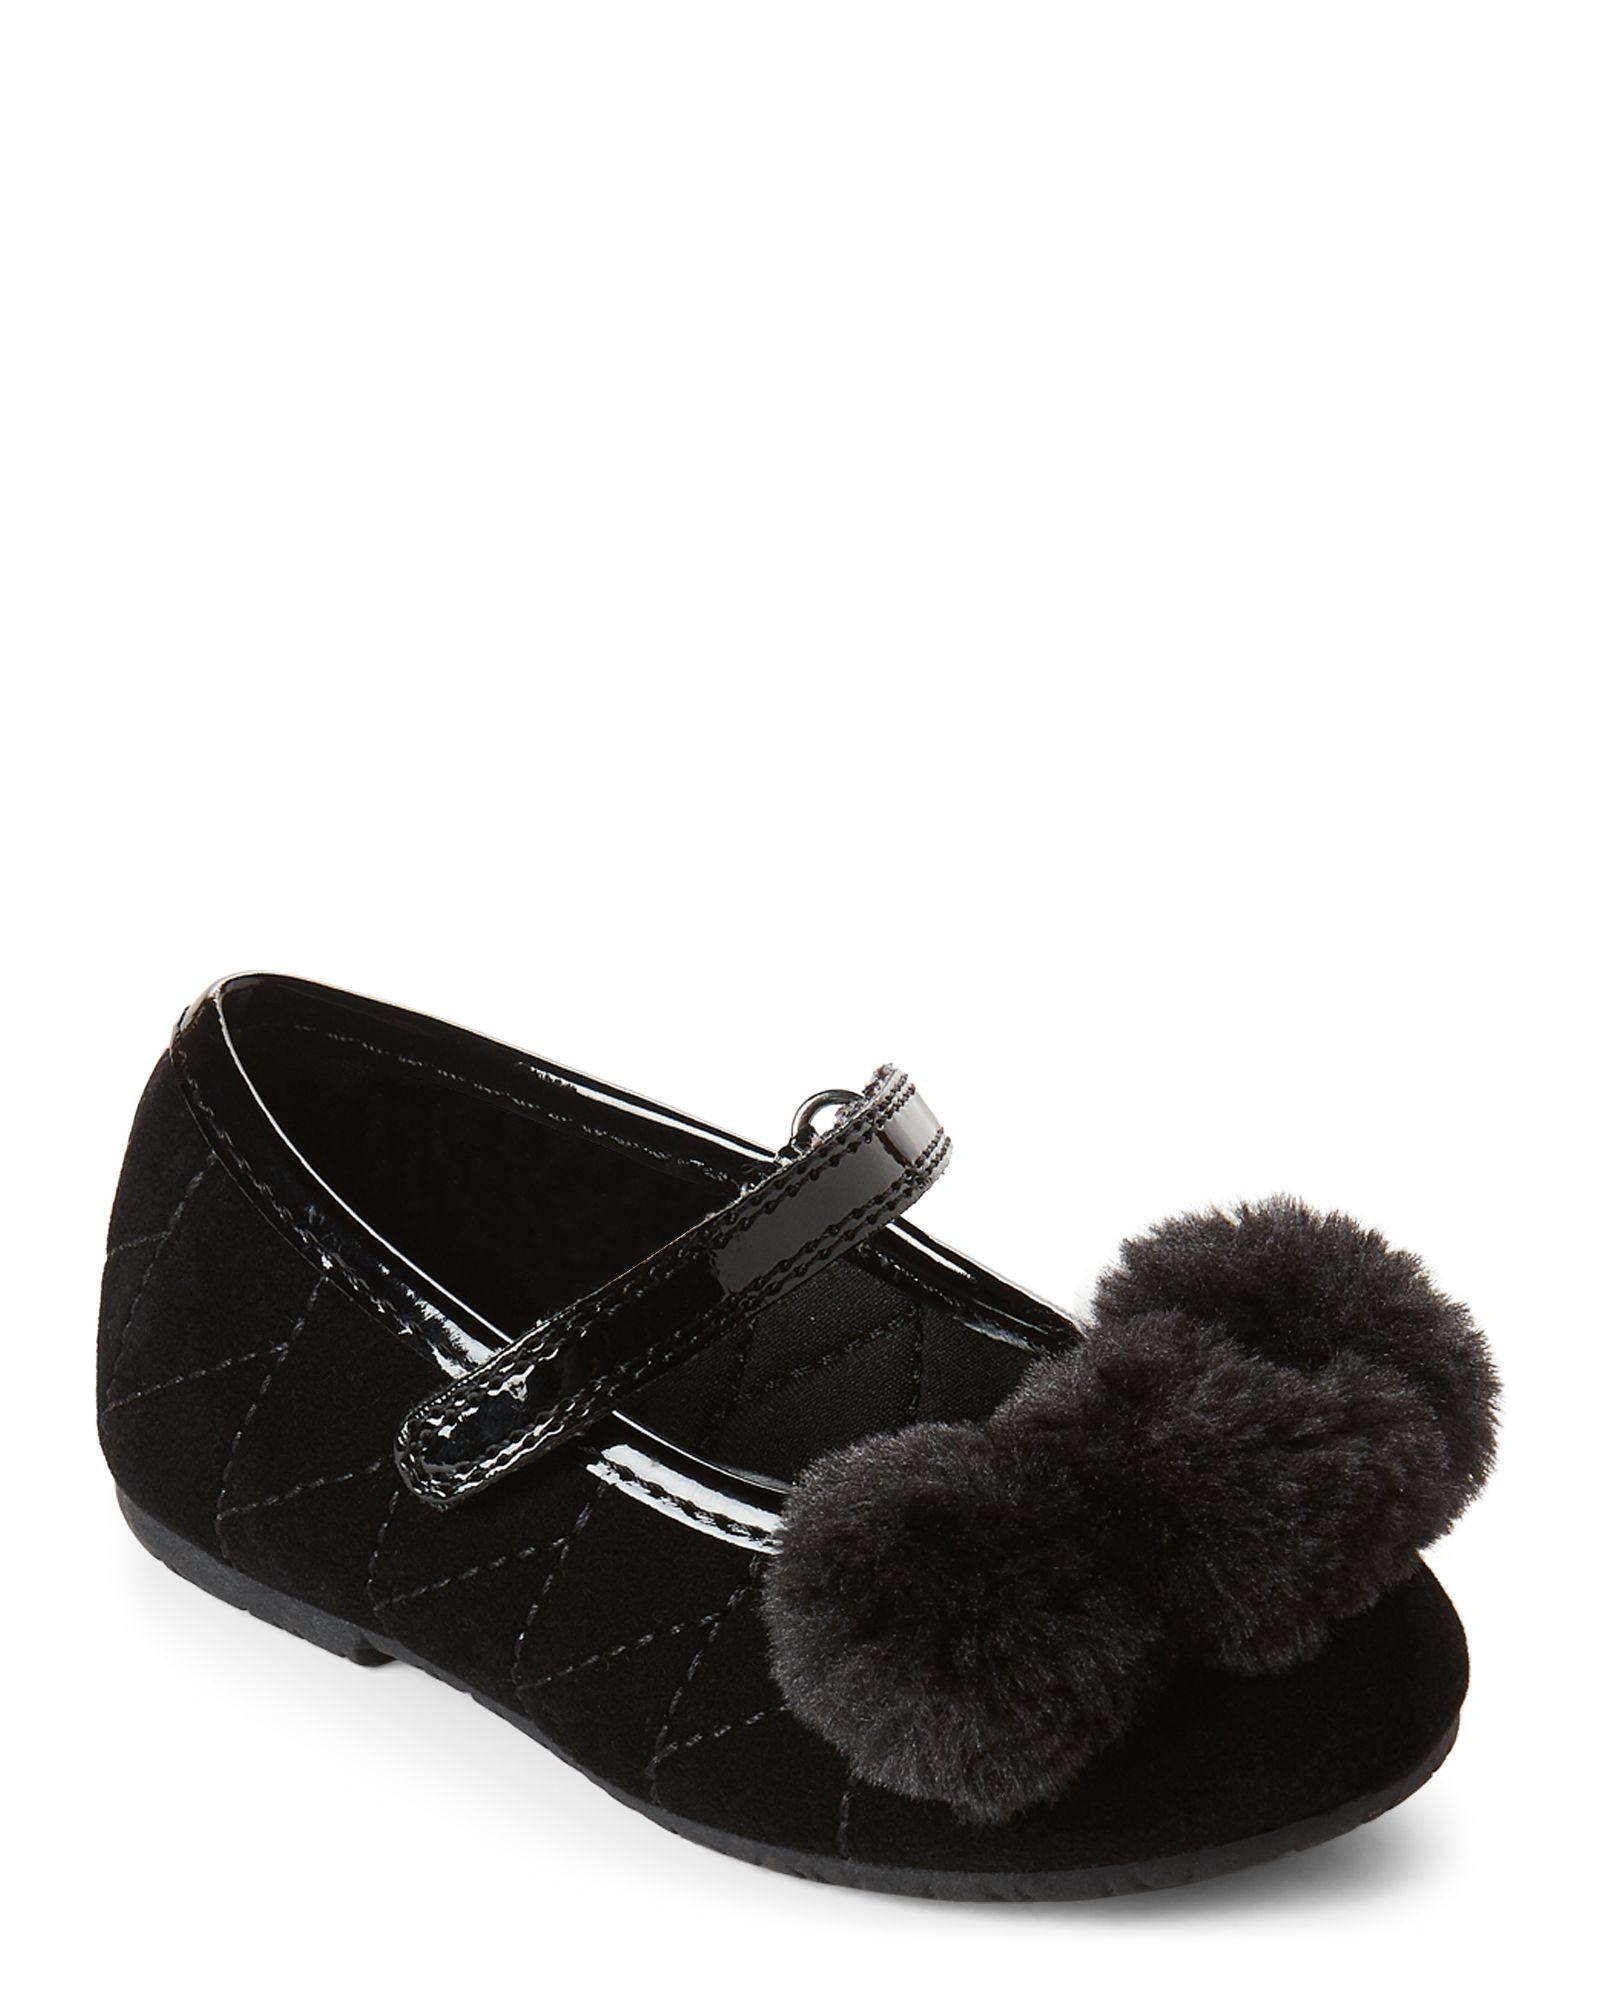 70dfa7198396f Toddler Girls) Black Lil Phoebe Pom Pom Flats   *Apparel ...